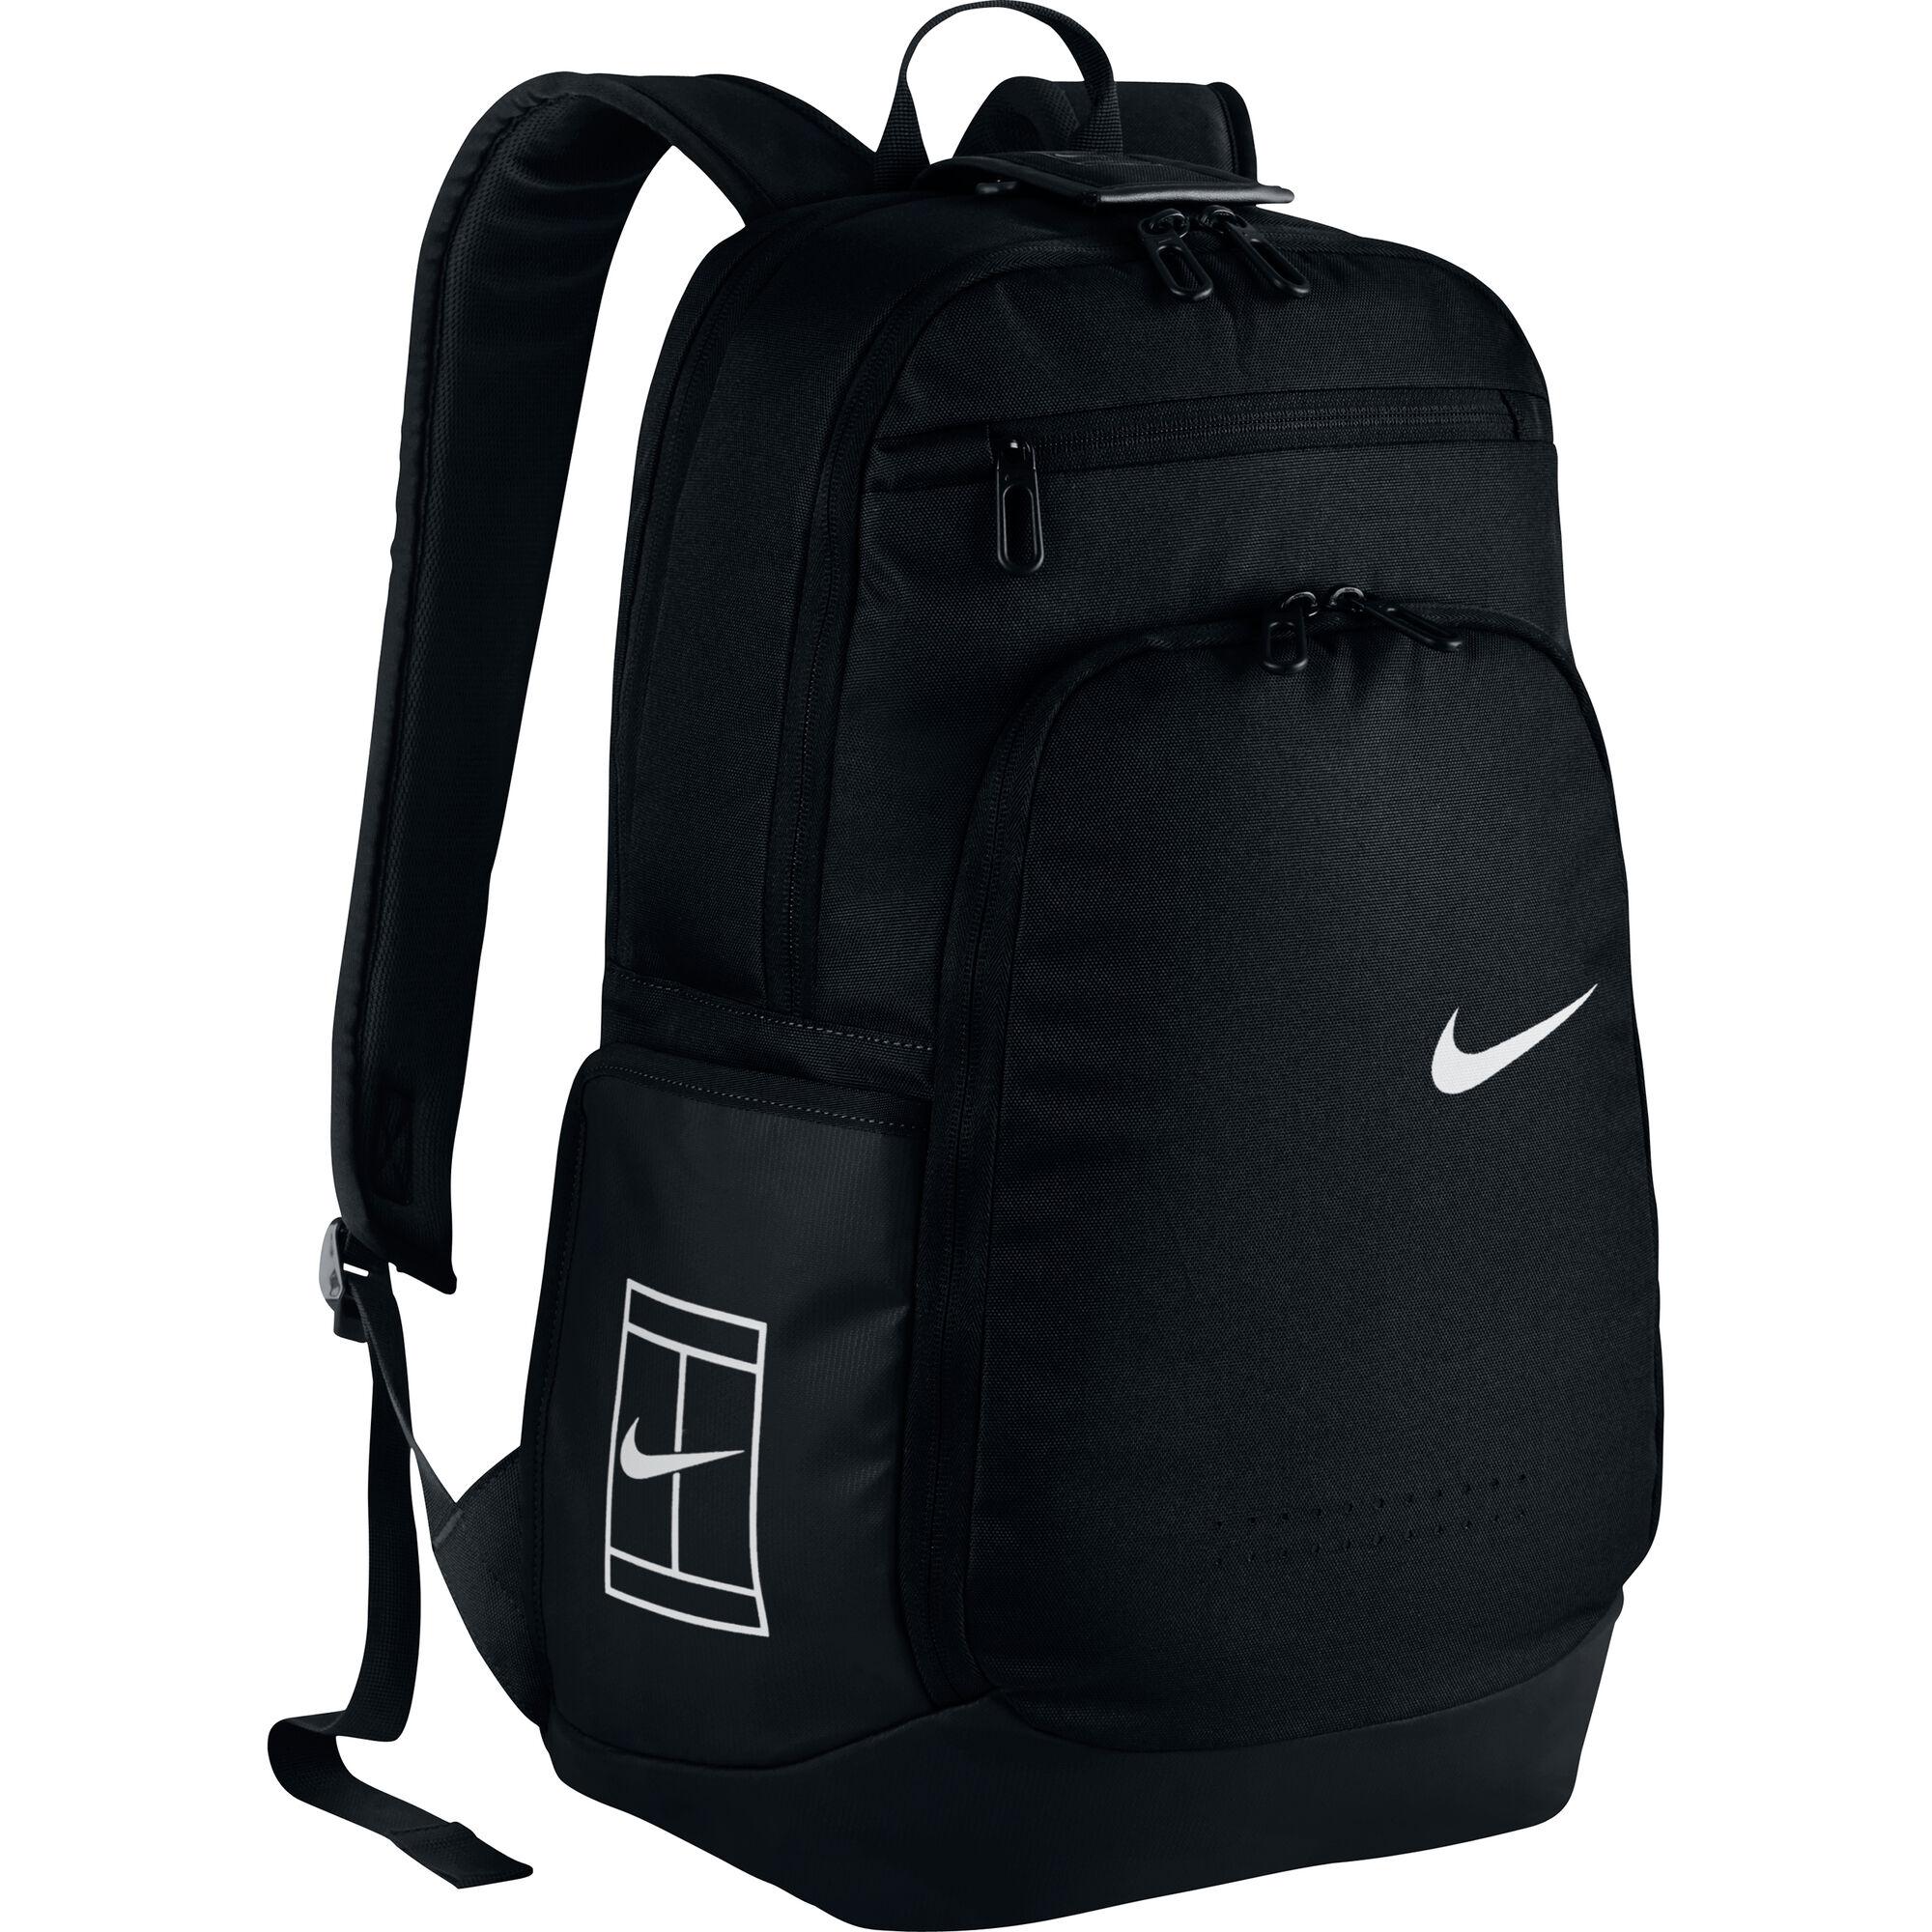 062a13eacba Nike Court Tech 2.0 Rugzak - Zwart, Wit online kopen | Tennis-Point